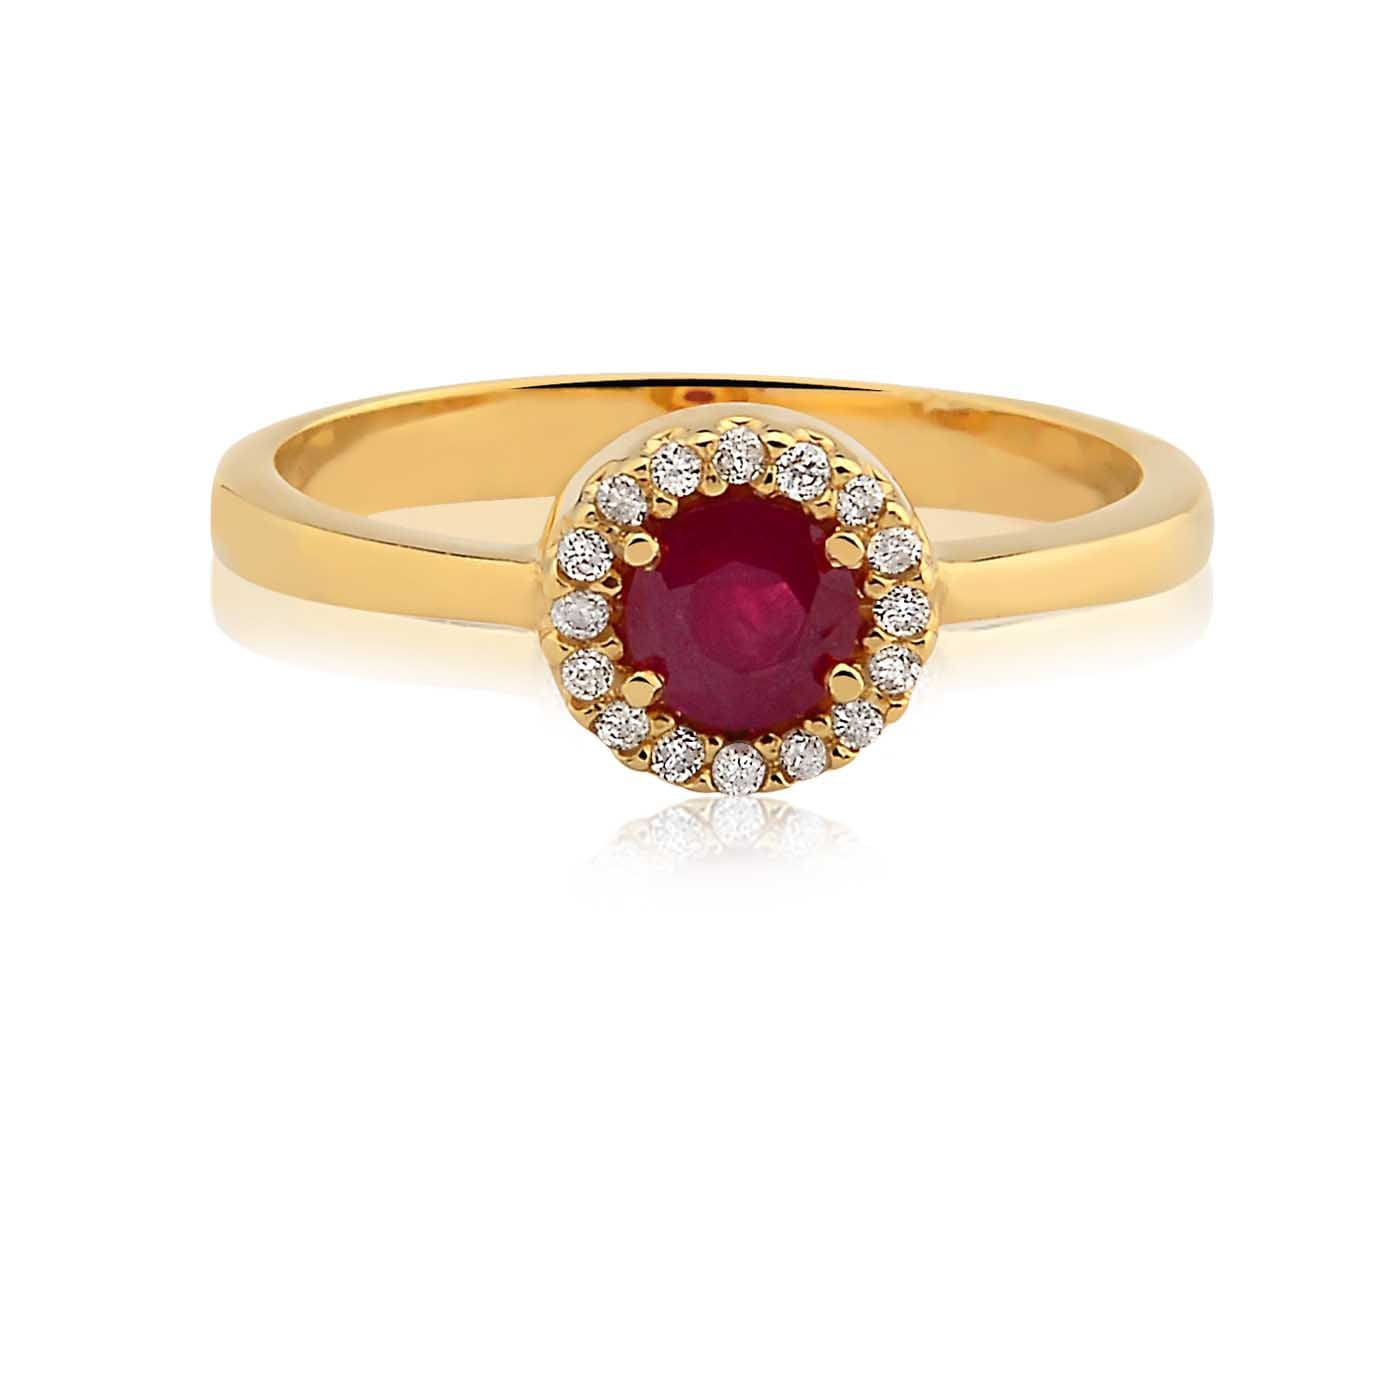 3e9a68cef64 Anel Ouro Amarelo Diamantes e Rubi - Colecao Classic Oriental